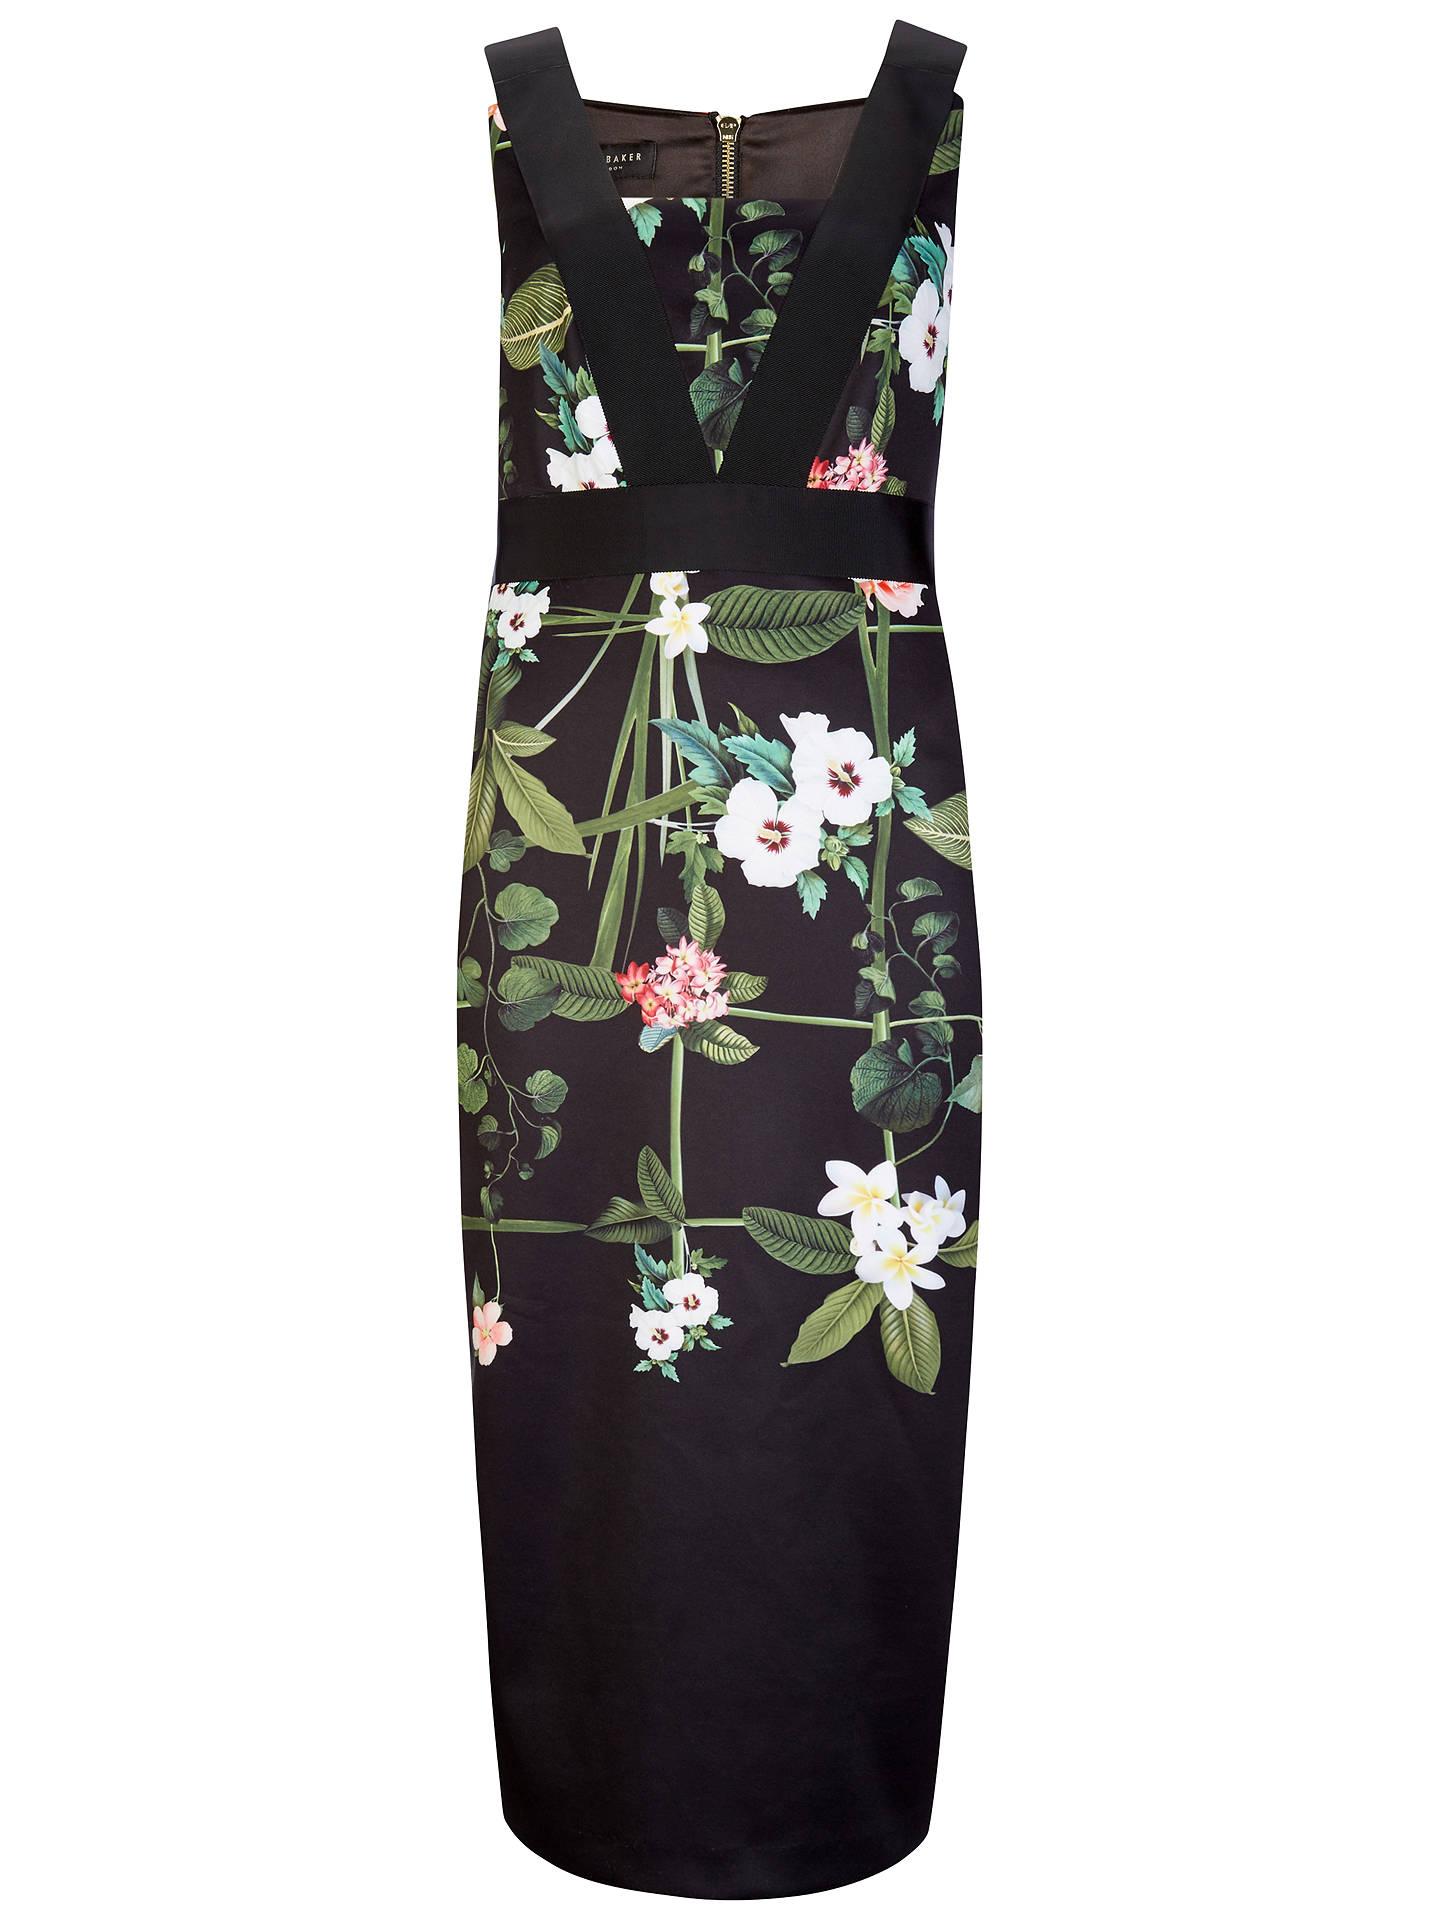 9f823fe715904b Buy Ted Baker Kacied Secret Trellis Elastic Dress